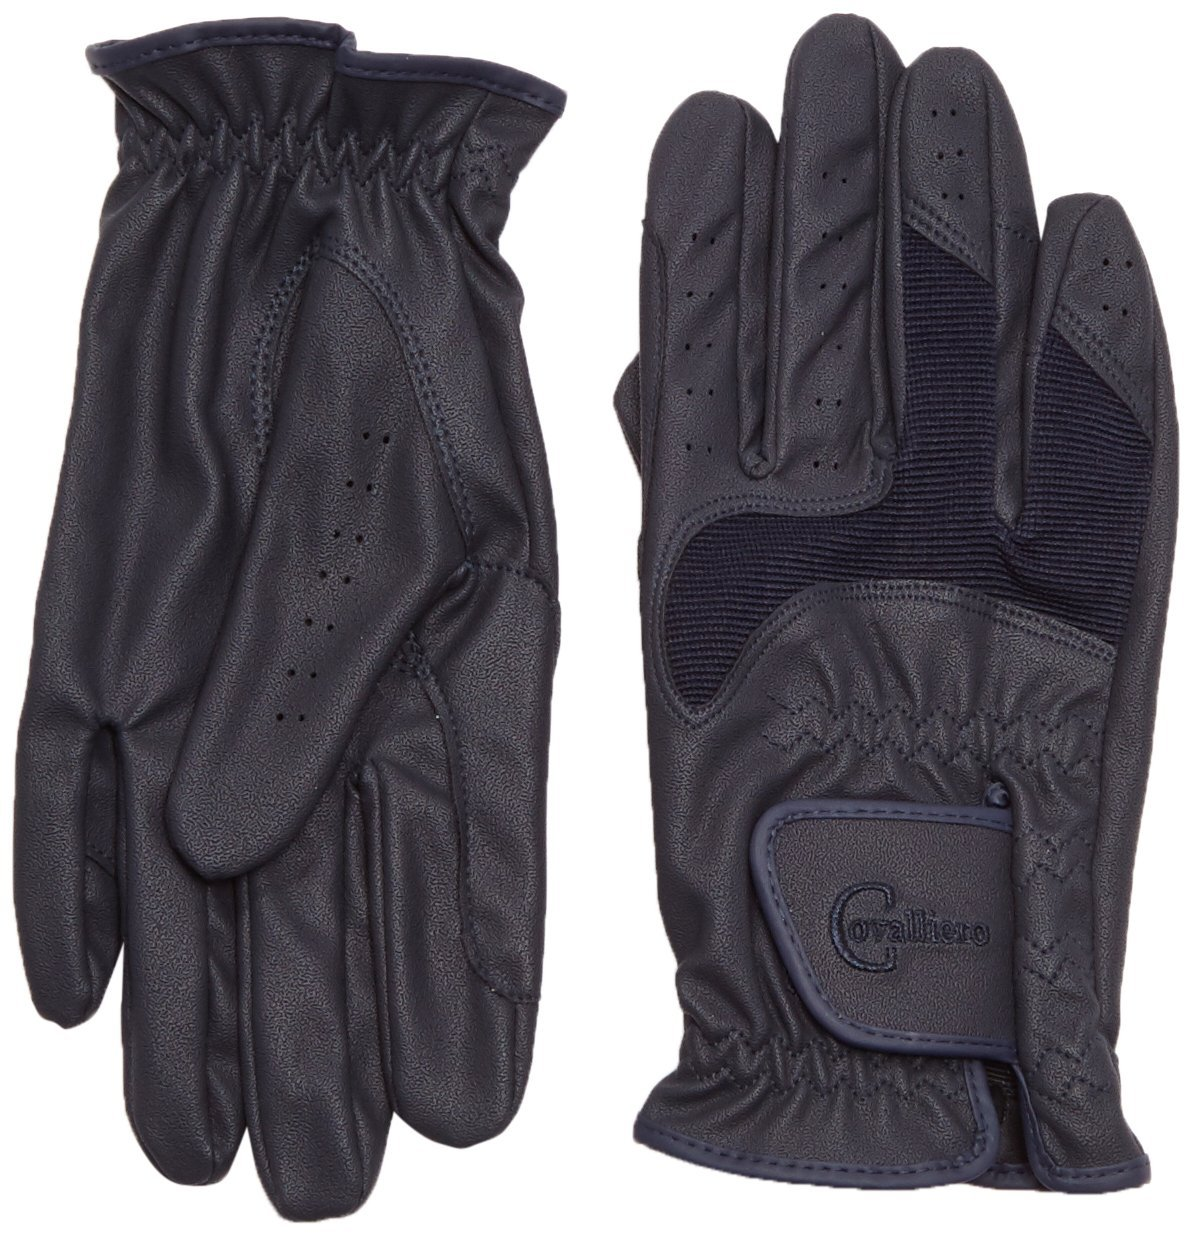 Covalliero gants gloria